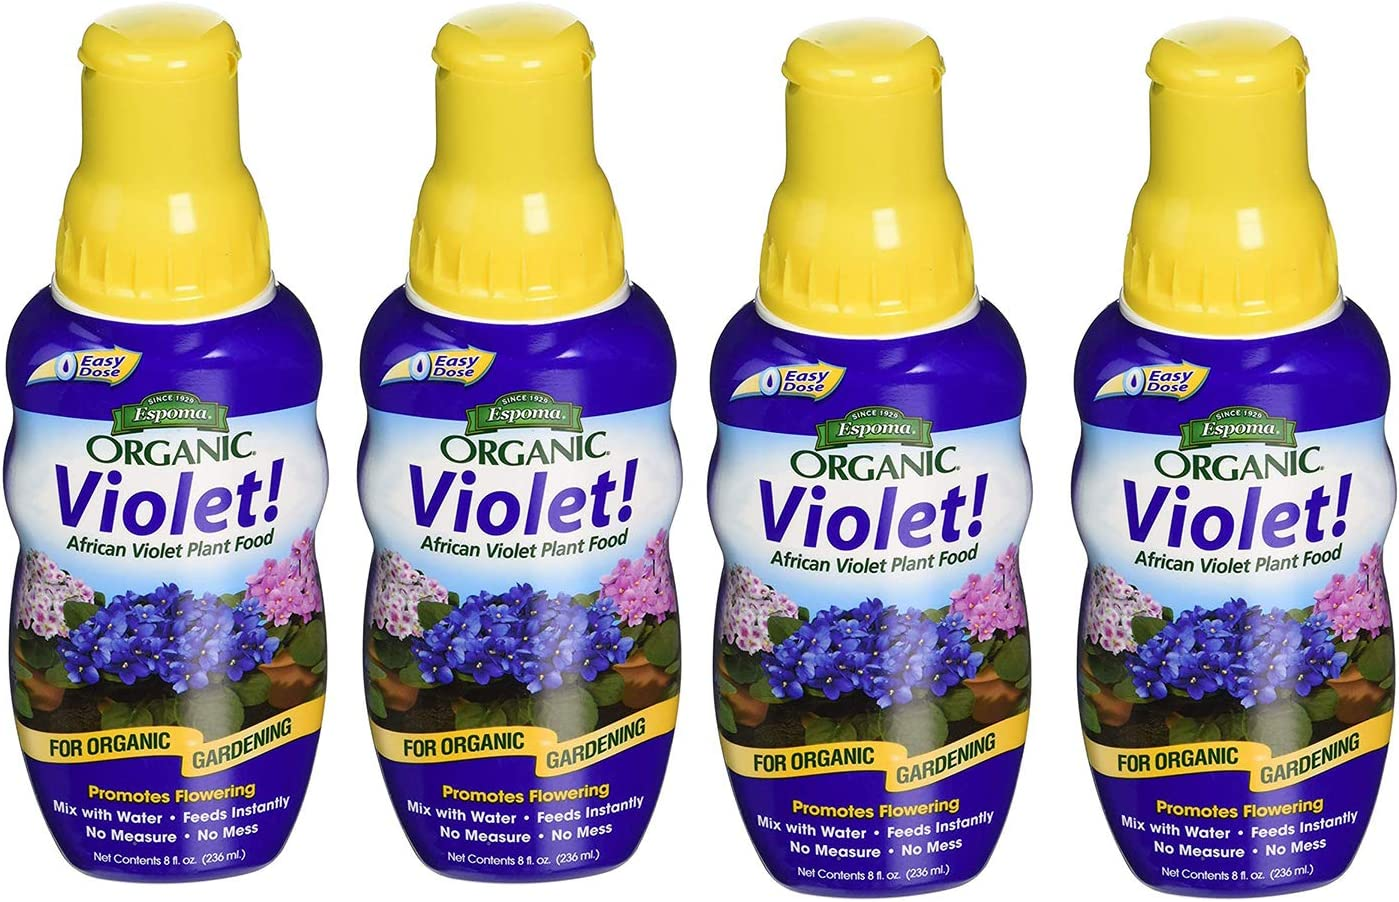 Espoma Violet! Liquid Plant Food, Natural & Organic African Violet Plant Food, 8 fl oz, Pack of 1